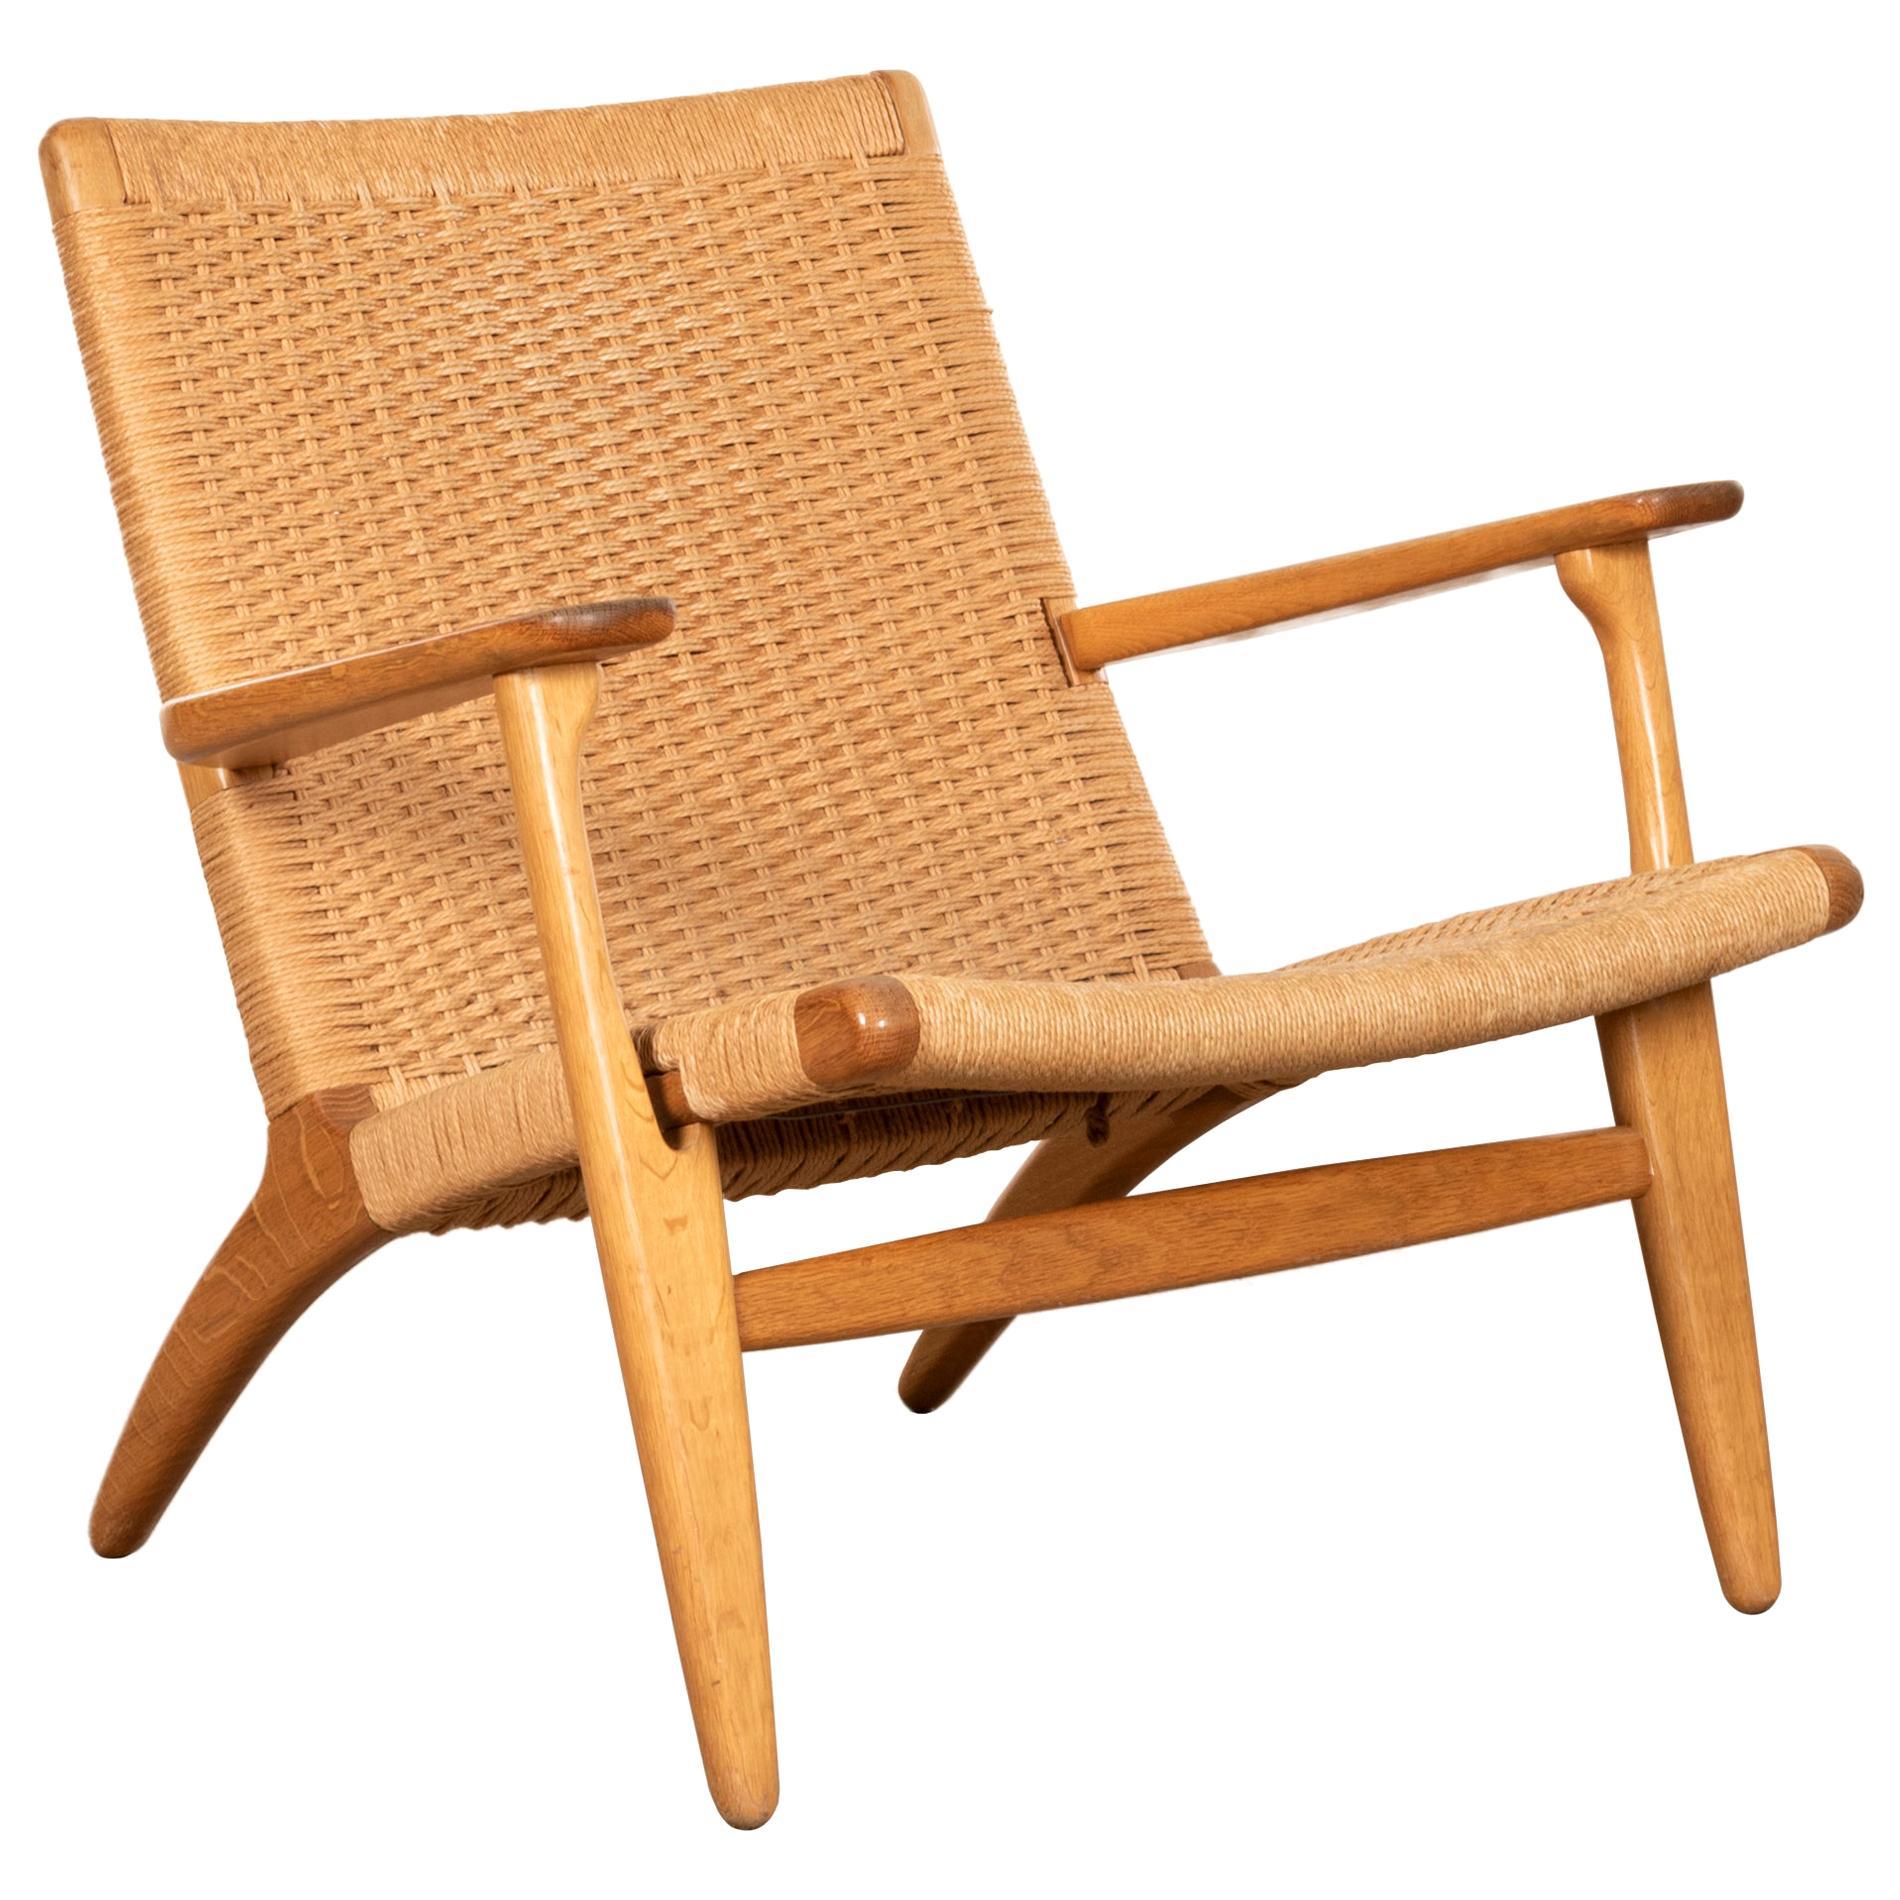 Hans J. Wegner CH25 Lounge Chair in Oak and Naturel Cord for Carl Hansen & Søn